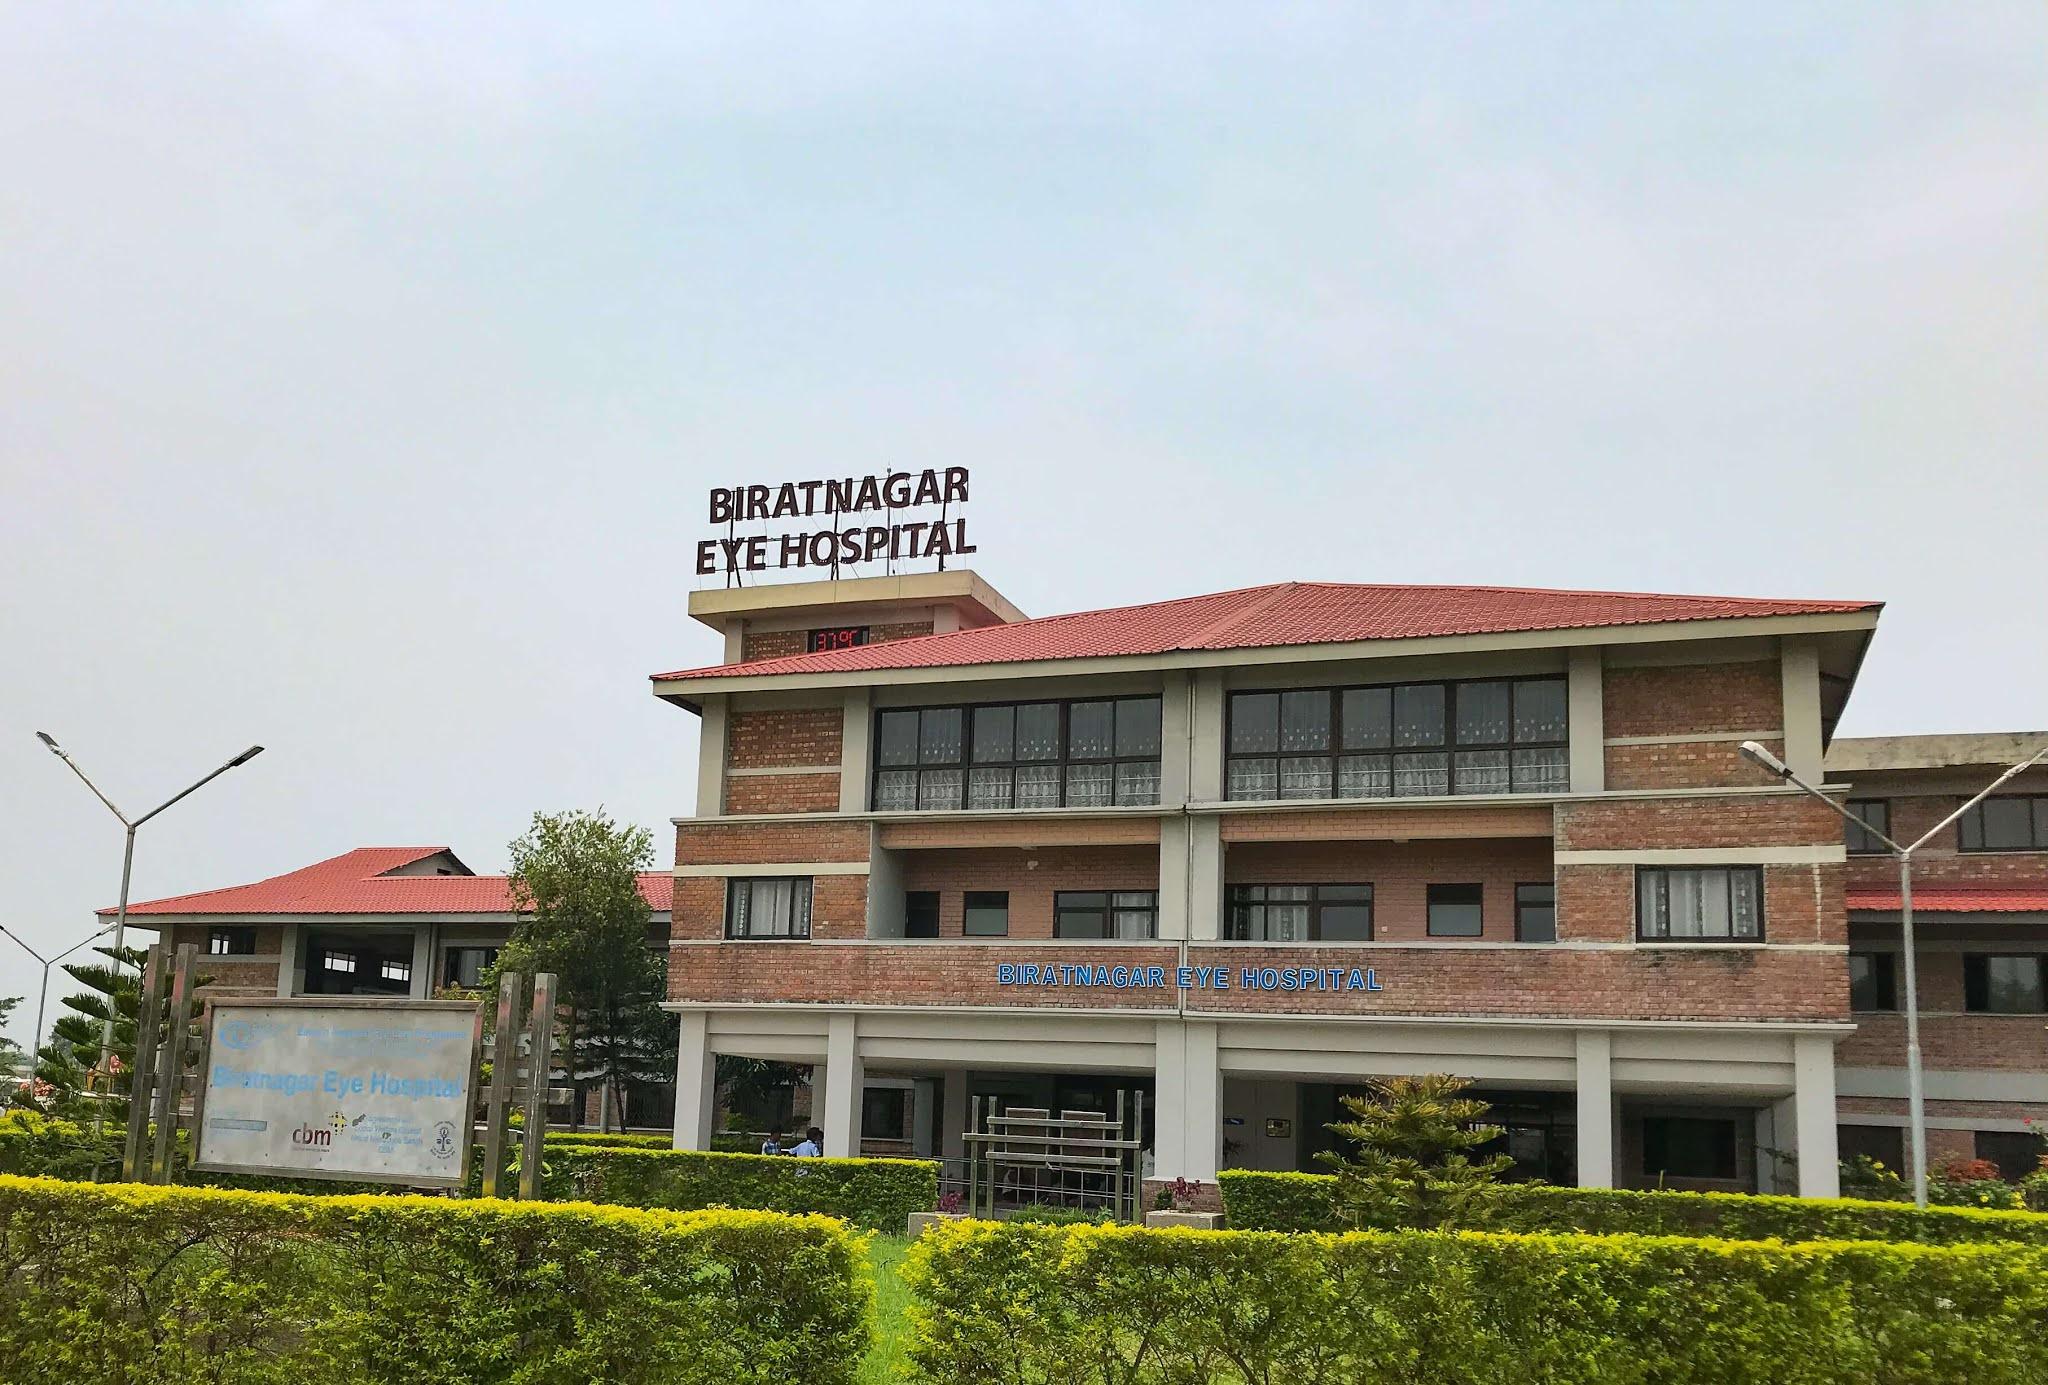 Biratnagar Eye Hospital Building